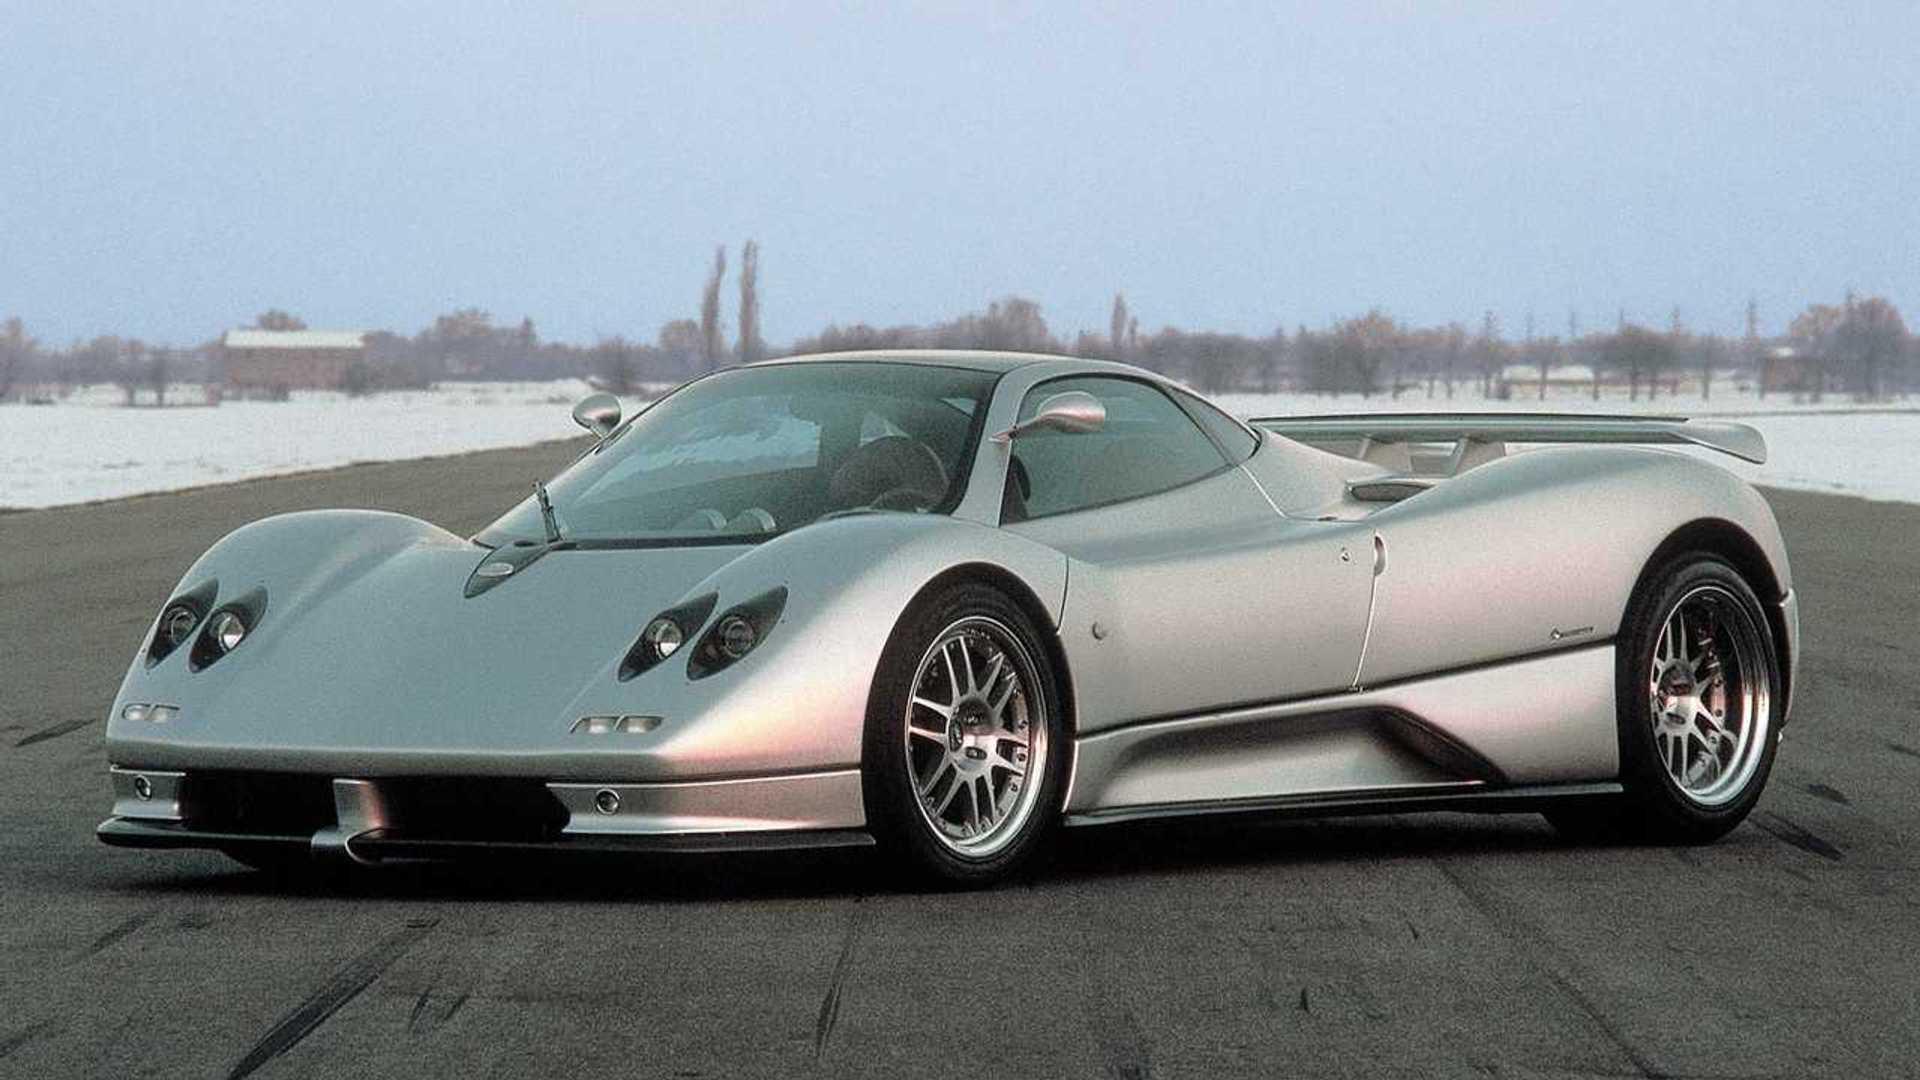 1999 Pagani Zonda C12: Supercar Revisited